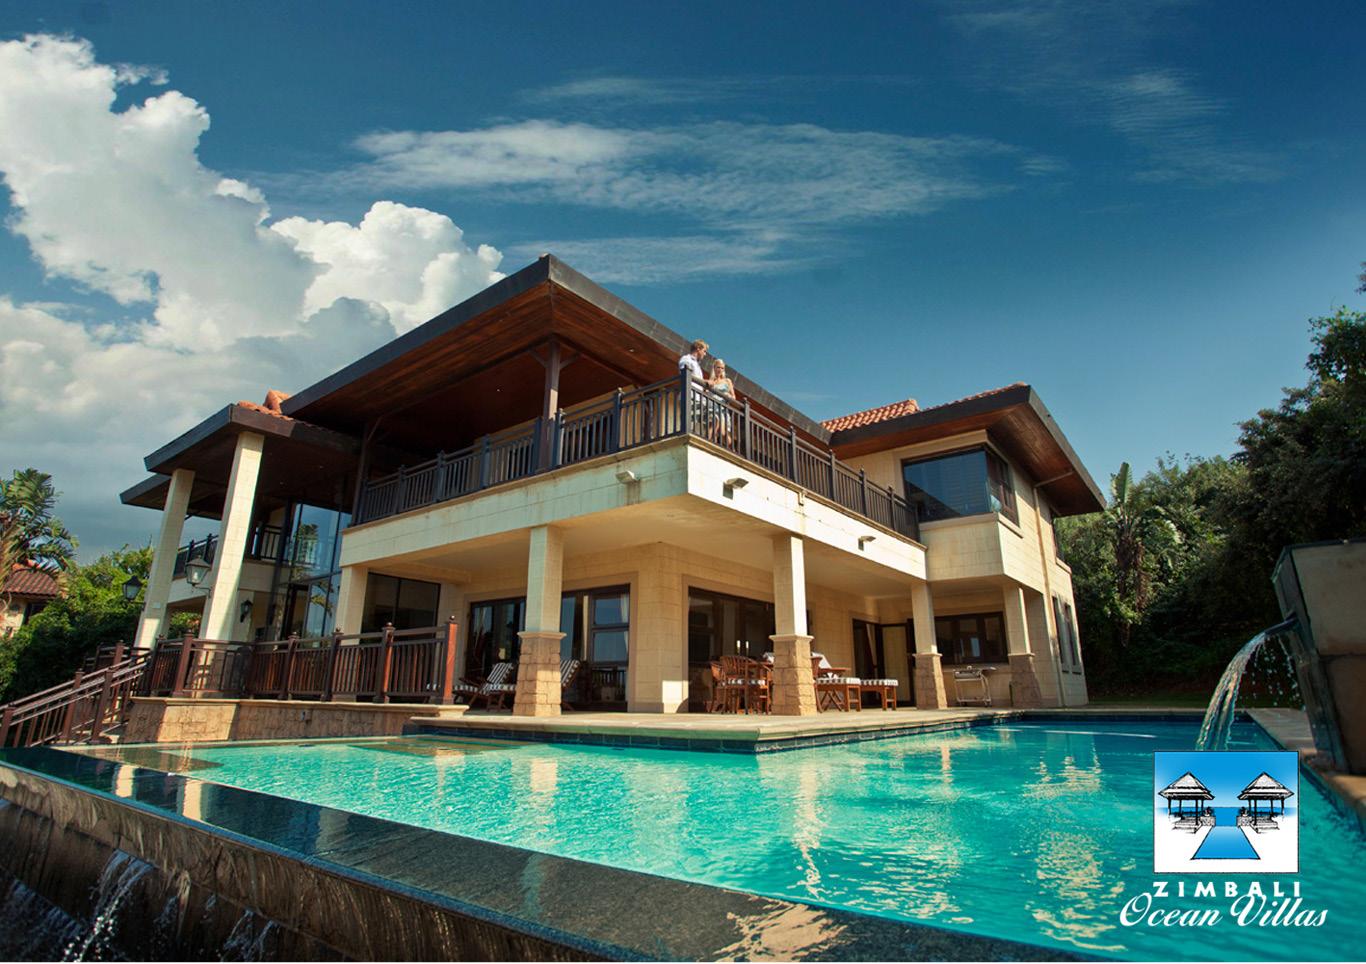 Zimbali Ocean Villas